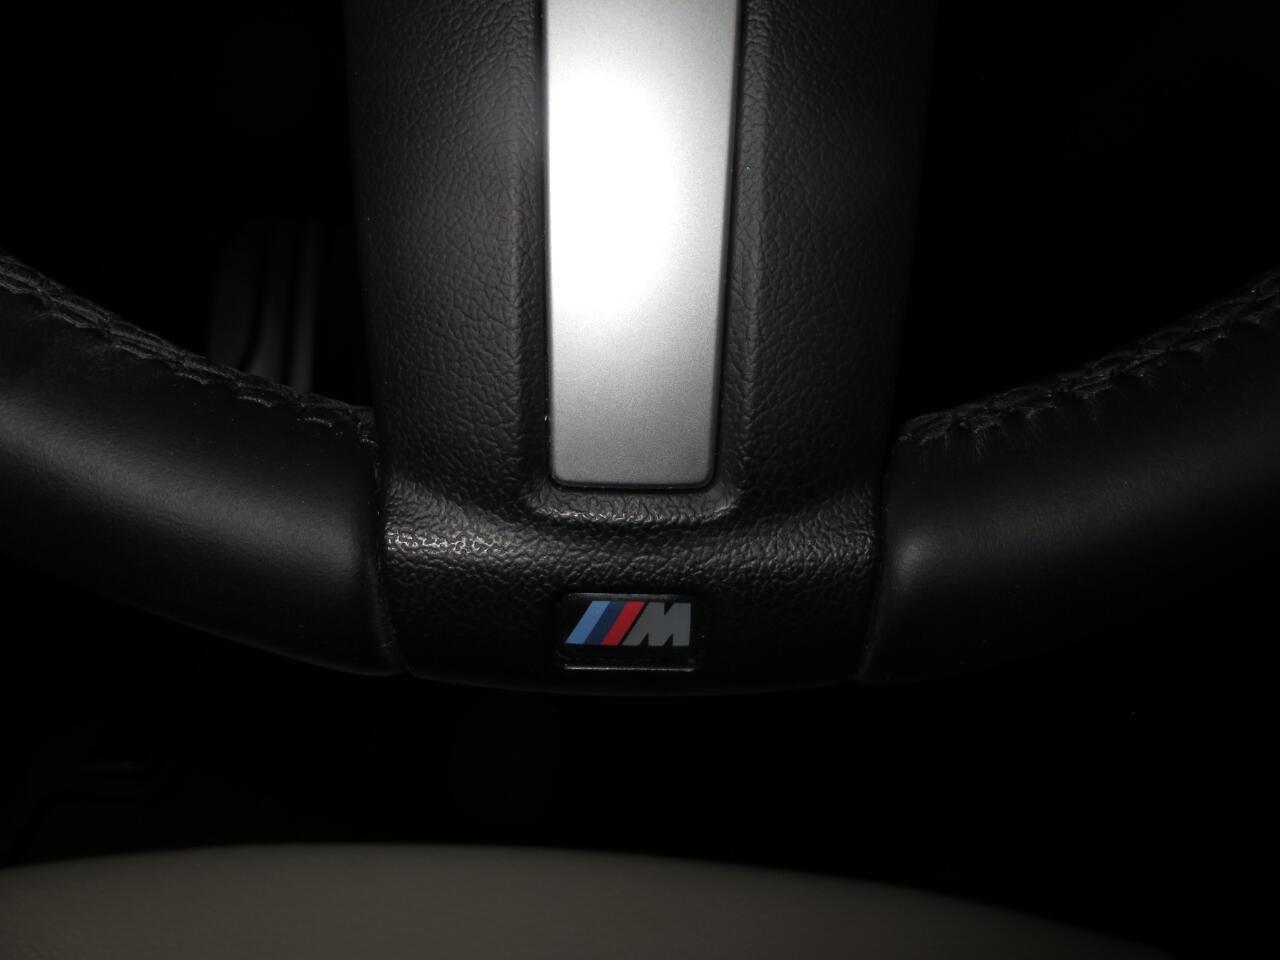 2016 BMW 4 Series 2dr Conv 435i RWD